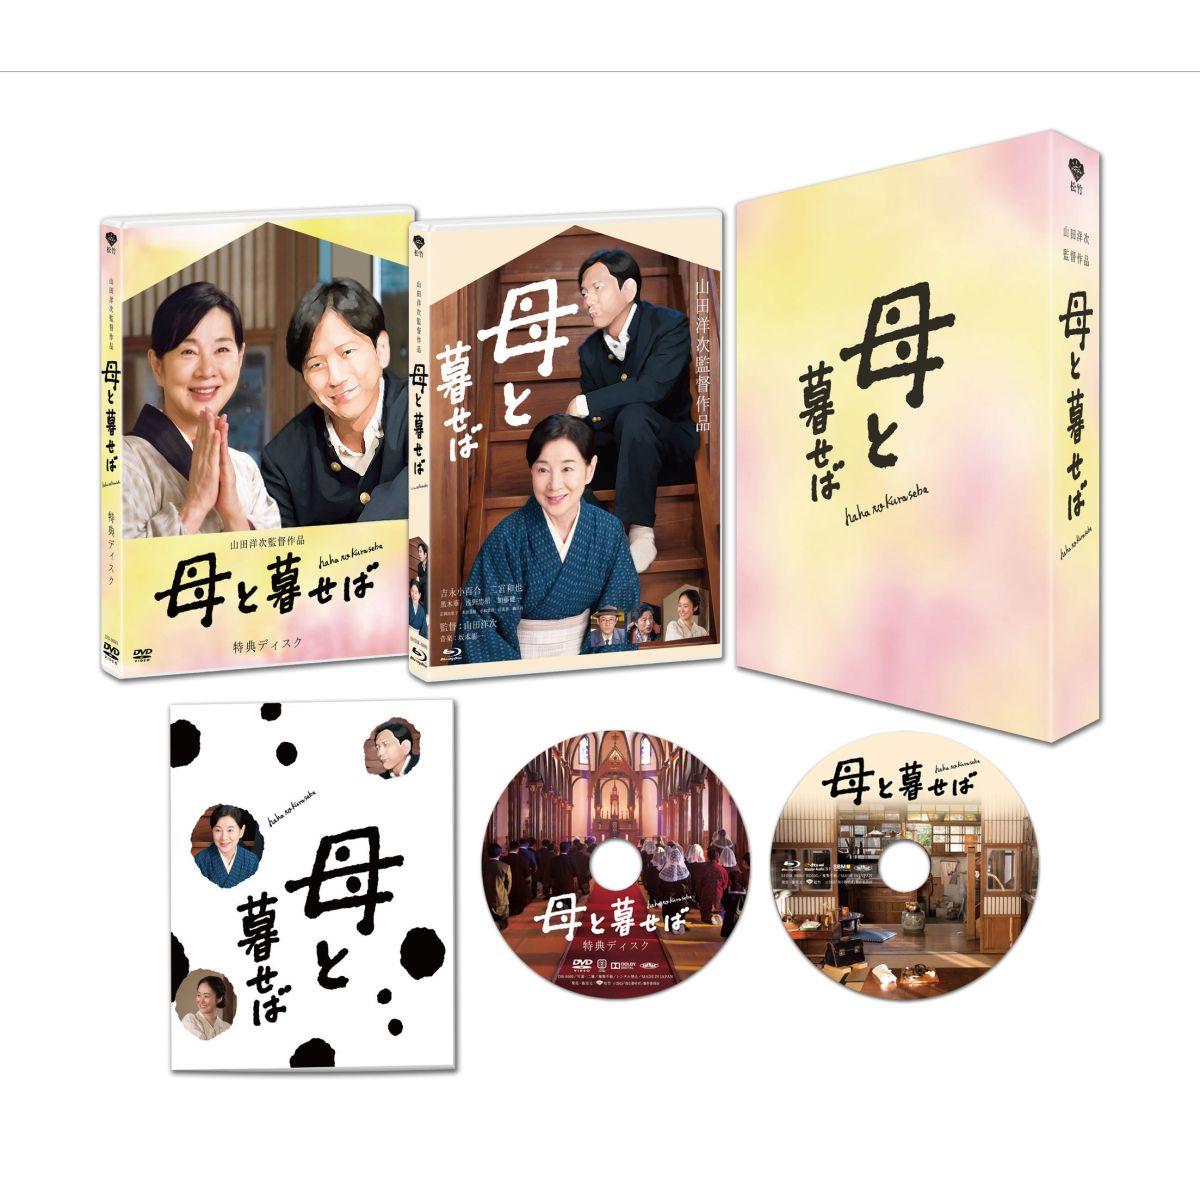 母と暮せば 豪華版【初回生産限定盤】【Blu-ray】 [ 吉永小百合 ]